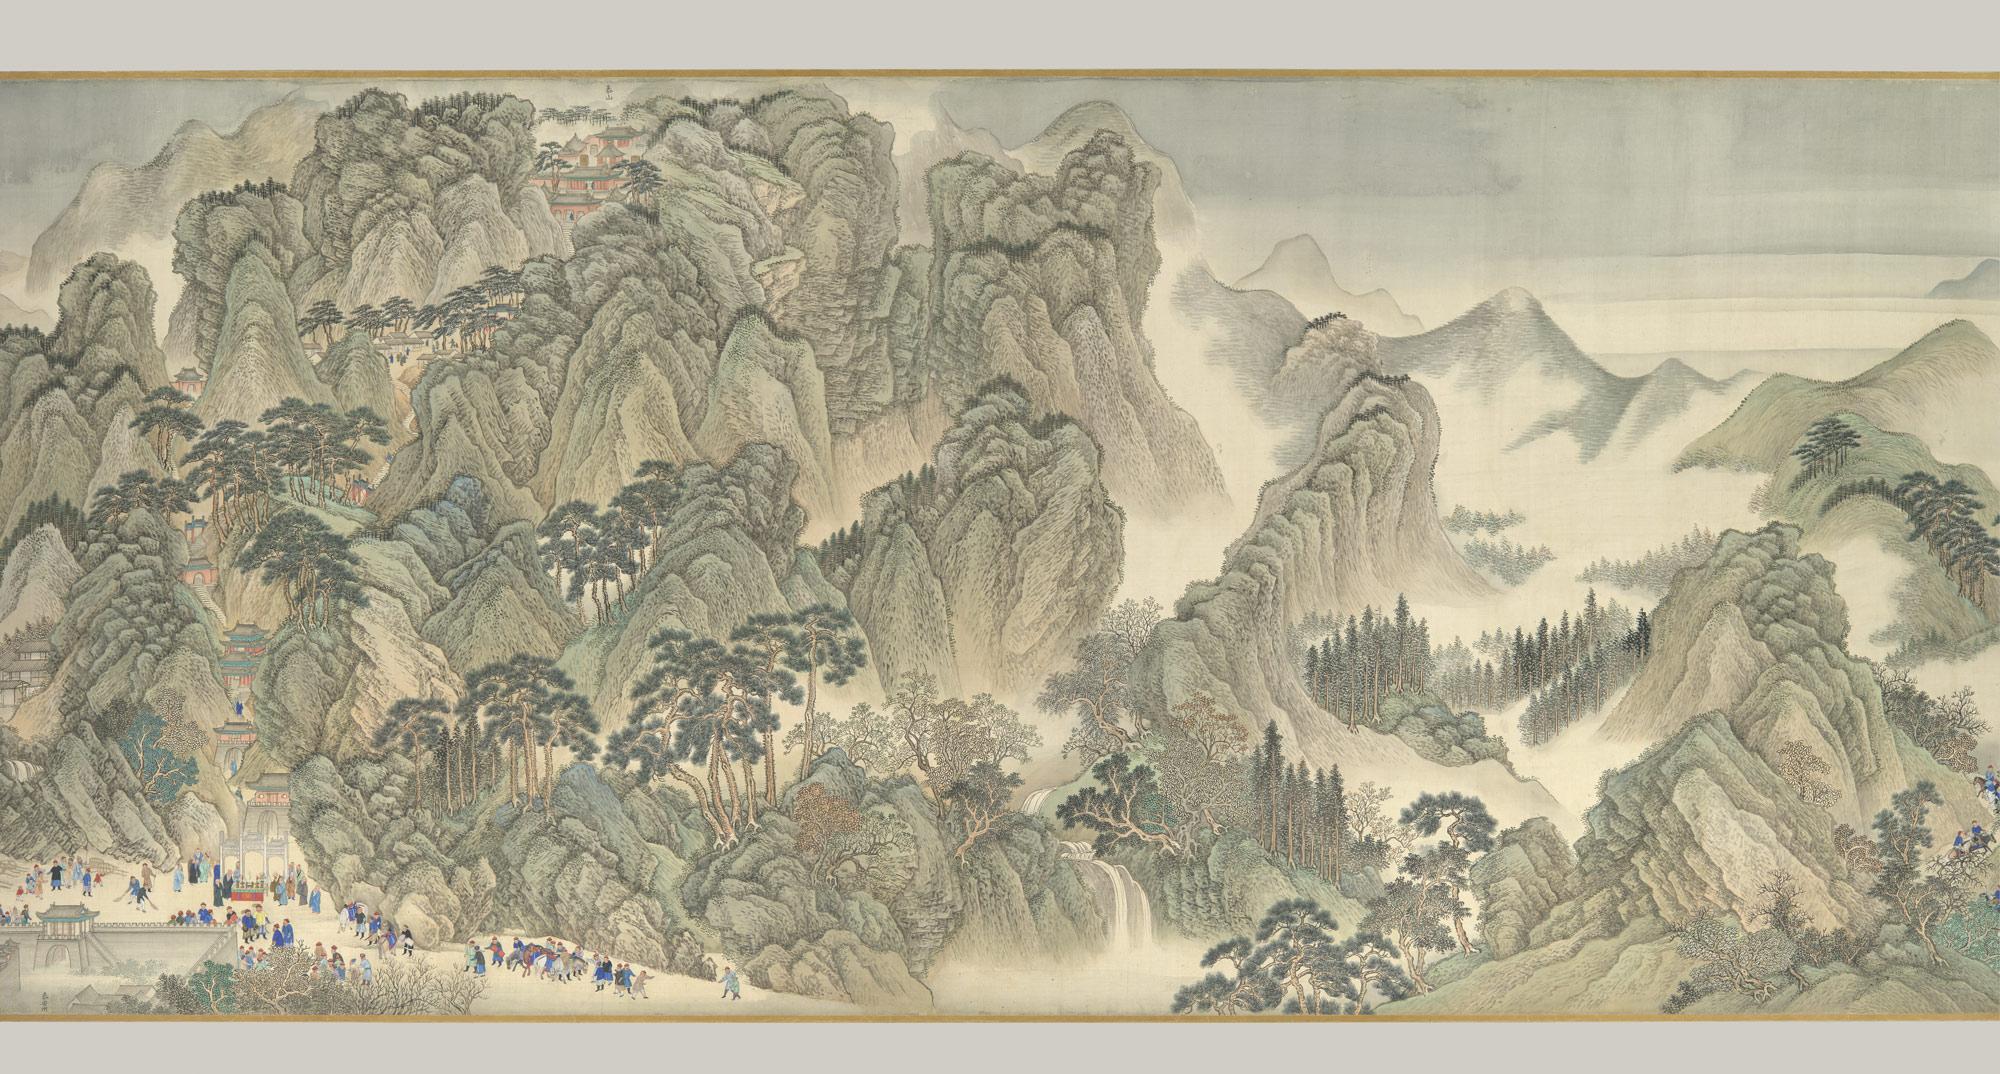 Ancient China Han Dynasty Technology